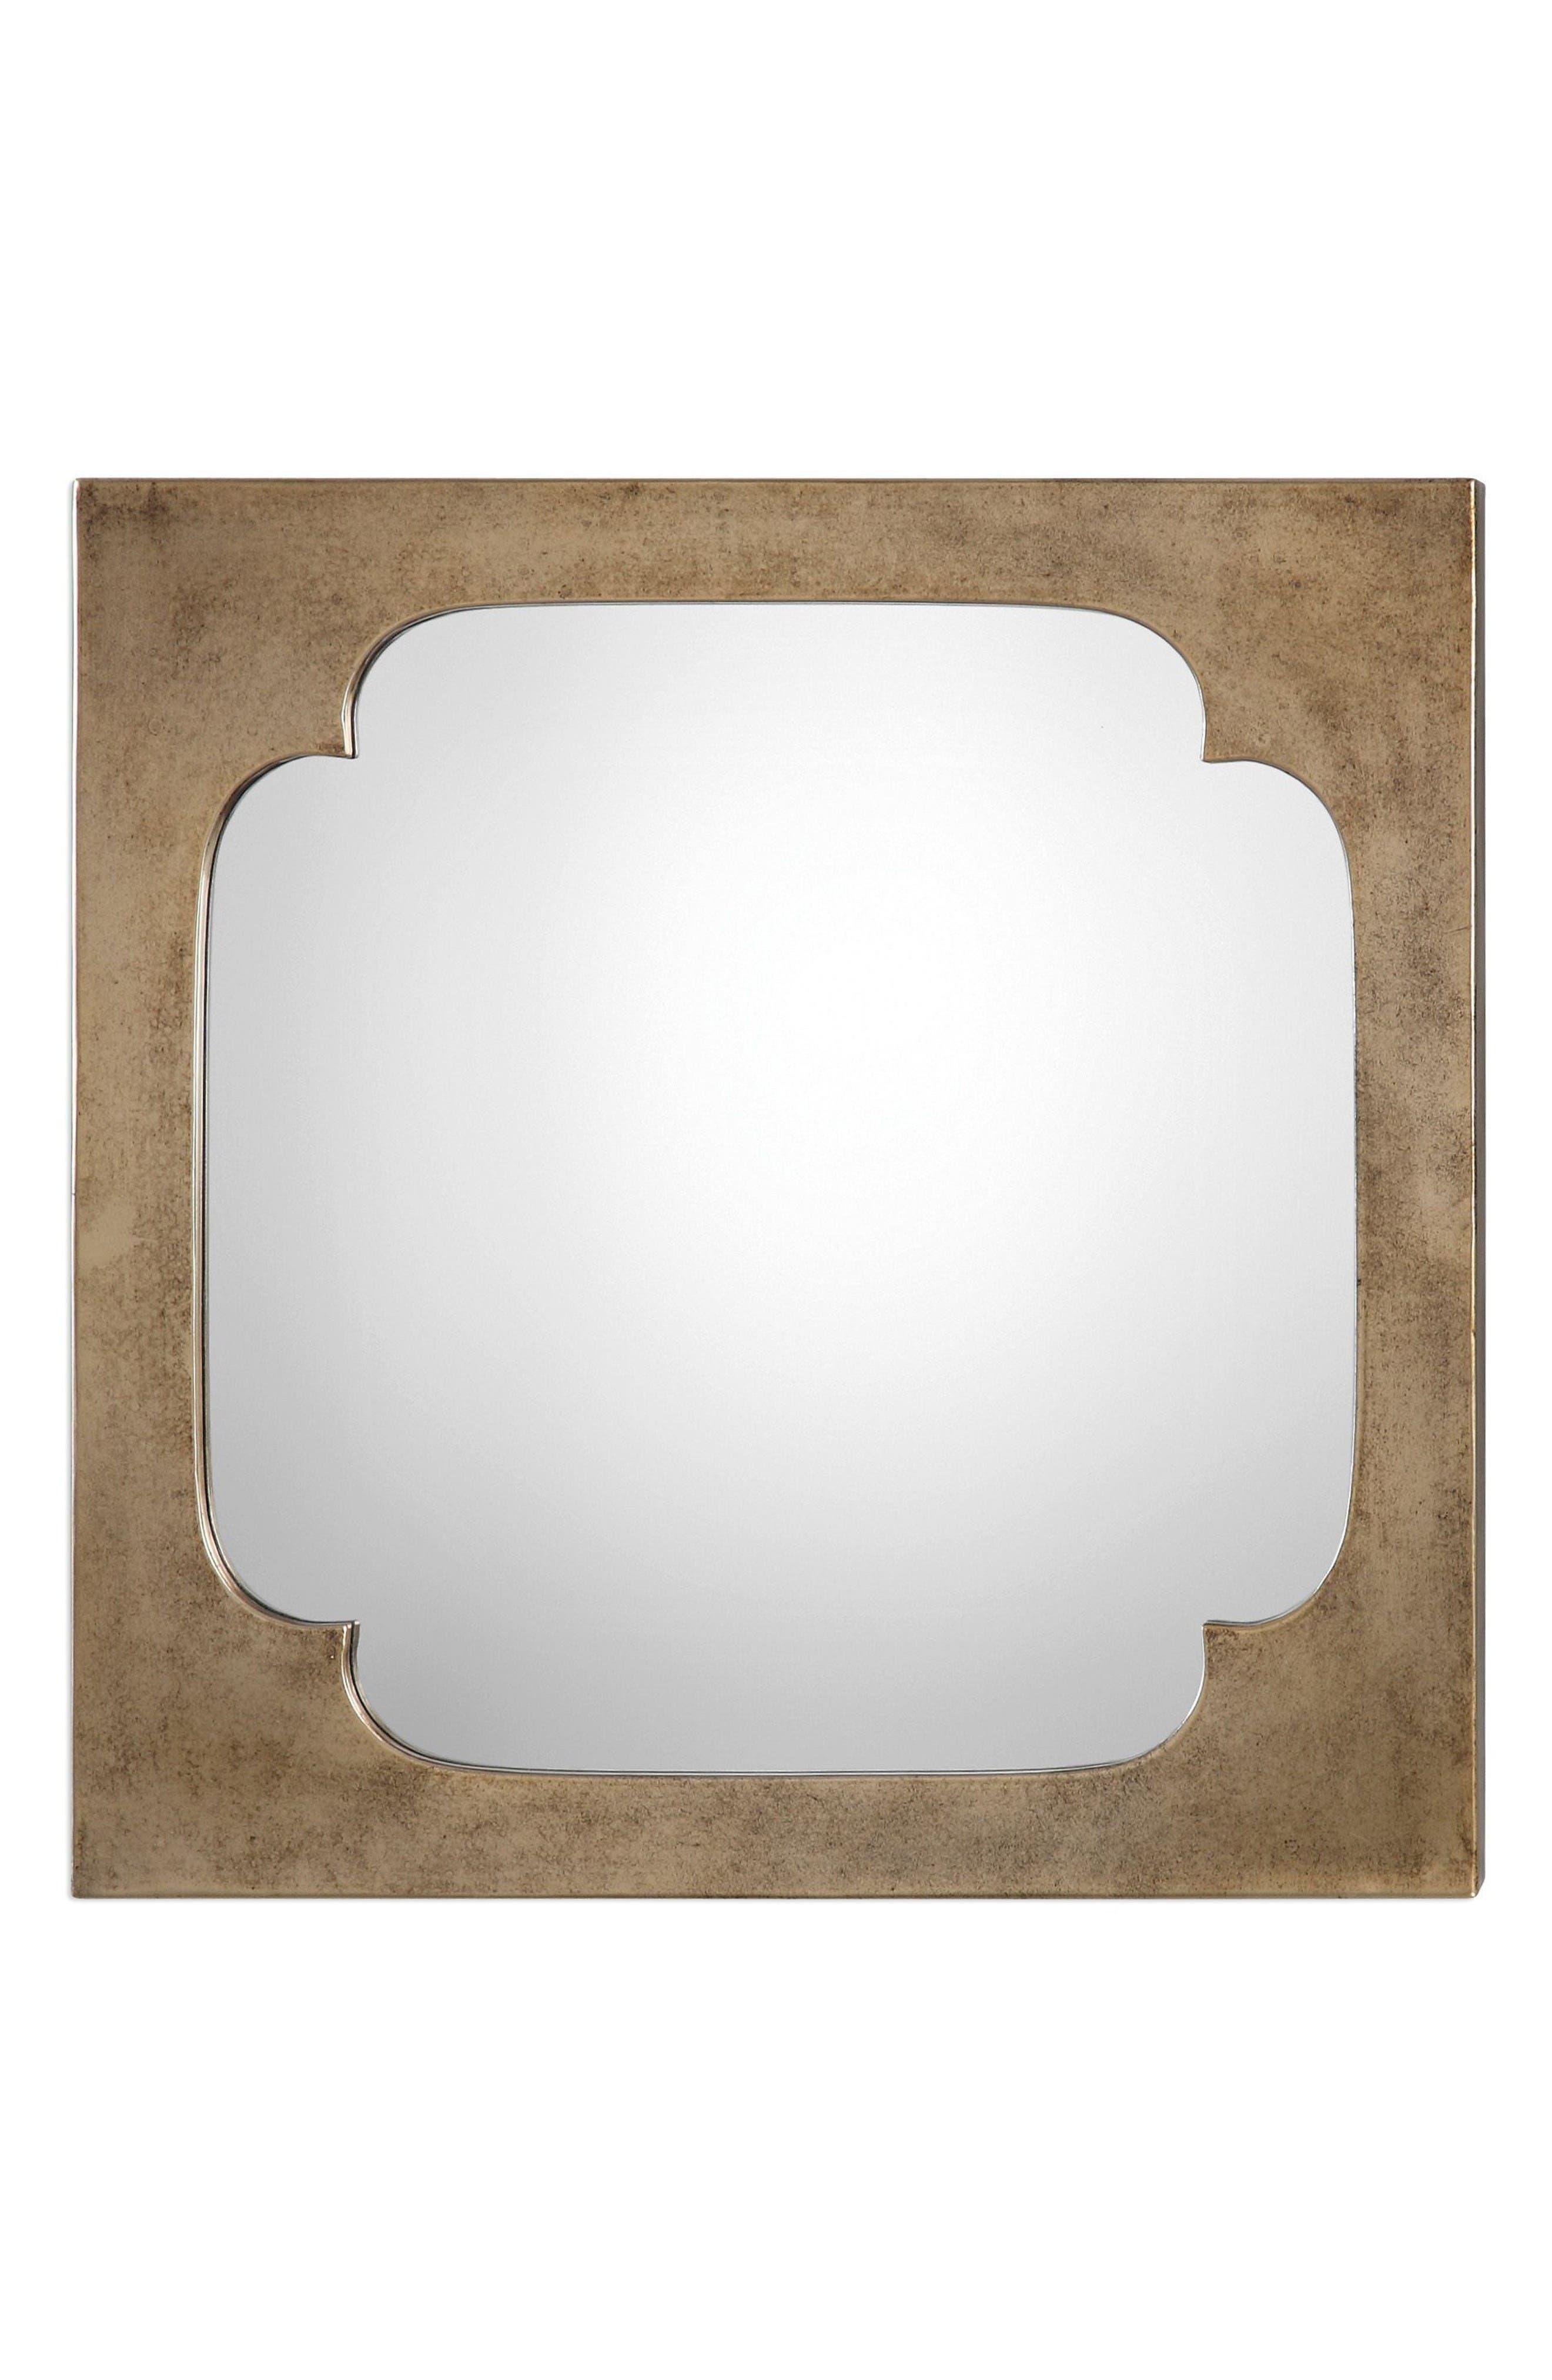 Uttermost Rania Wall Mirror